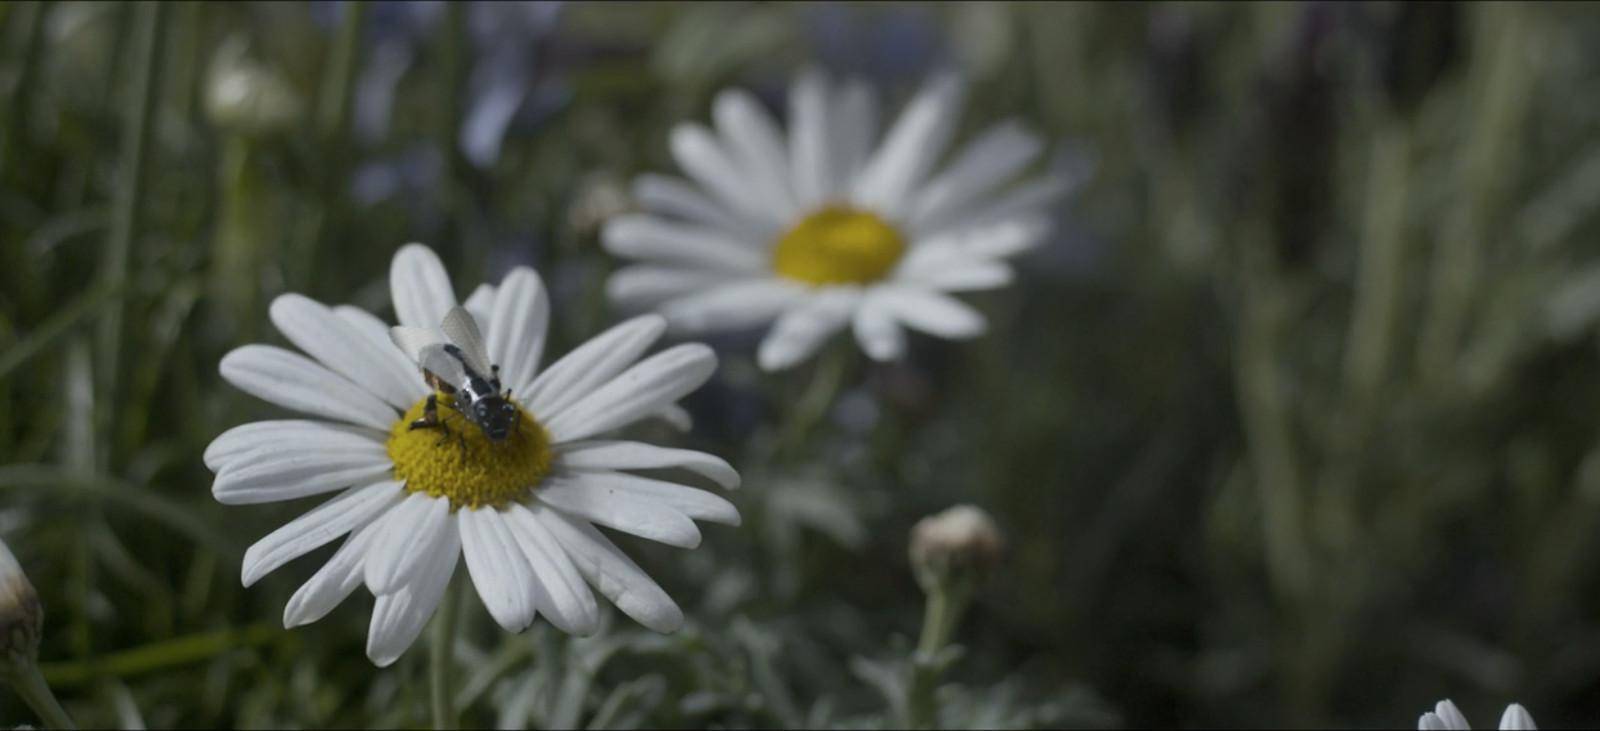 Hängengeblieben 2017 - Insektensterben